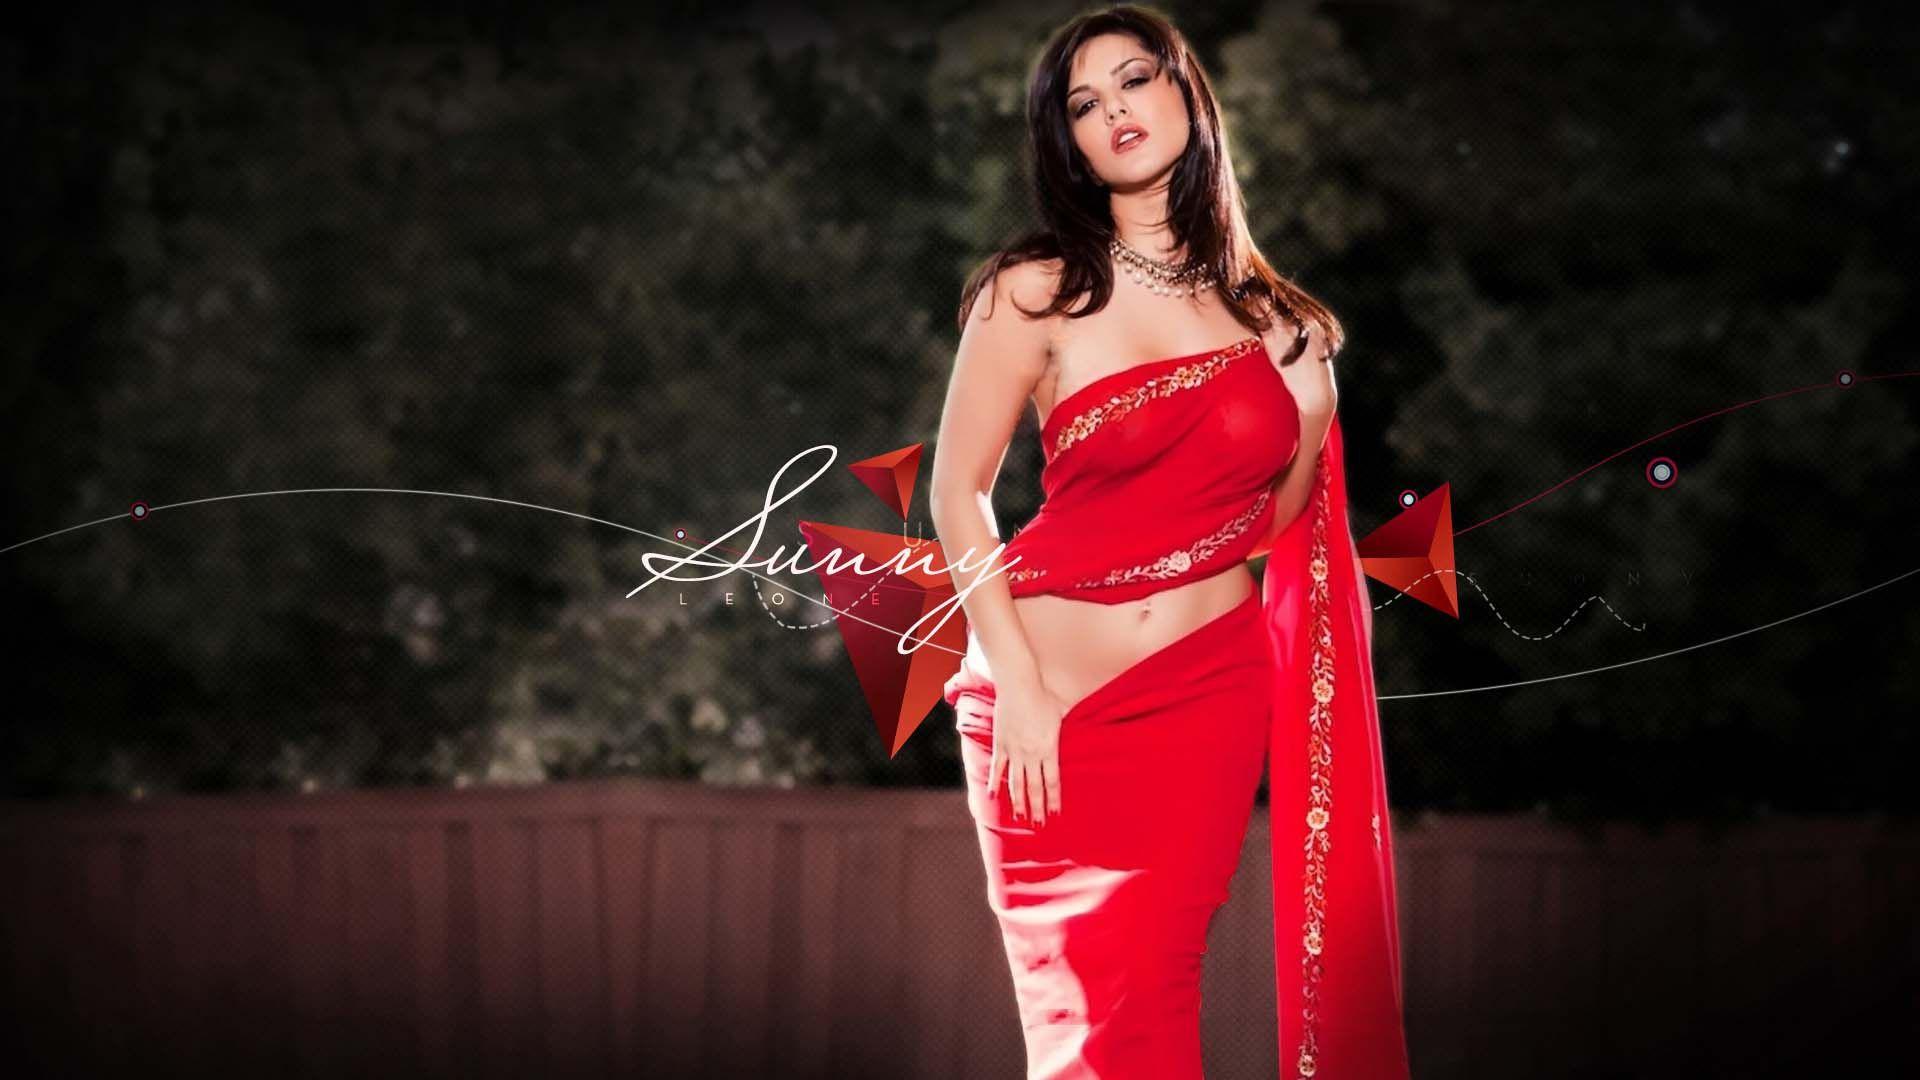 Sunny Leone Looks Hot In Red Saree Wallpaper - Sunny Leone Hot Wallpaper Hd - HD Wallpaper